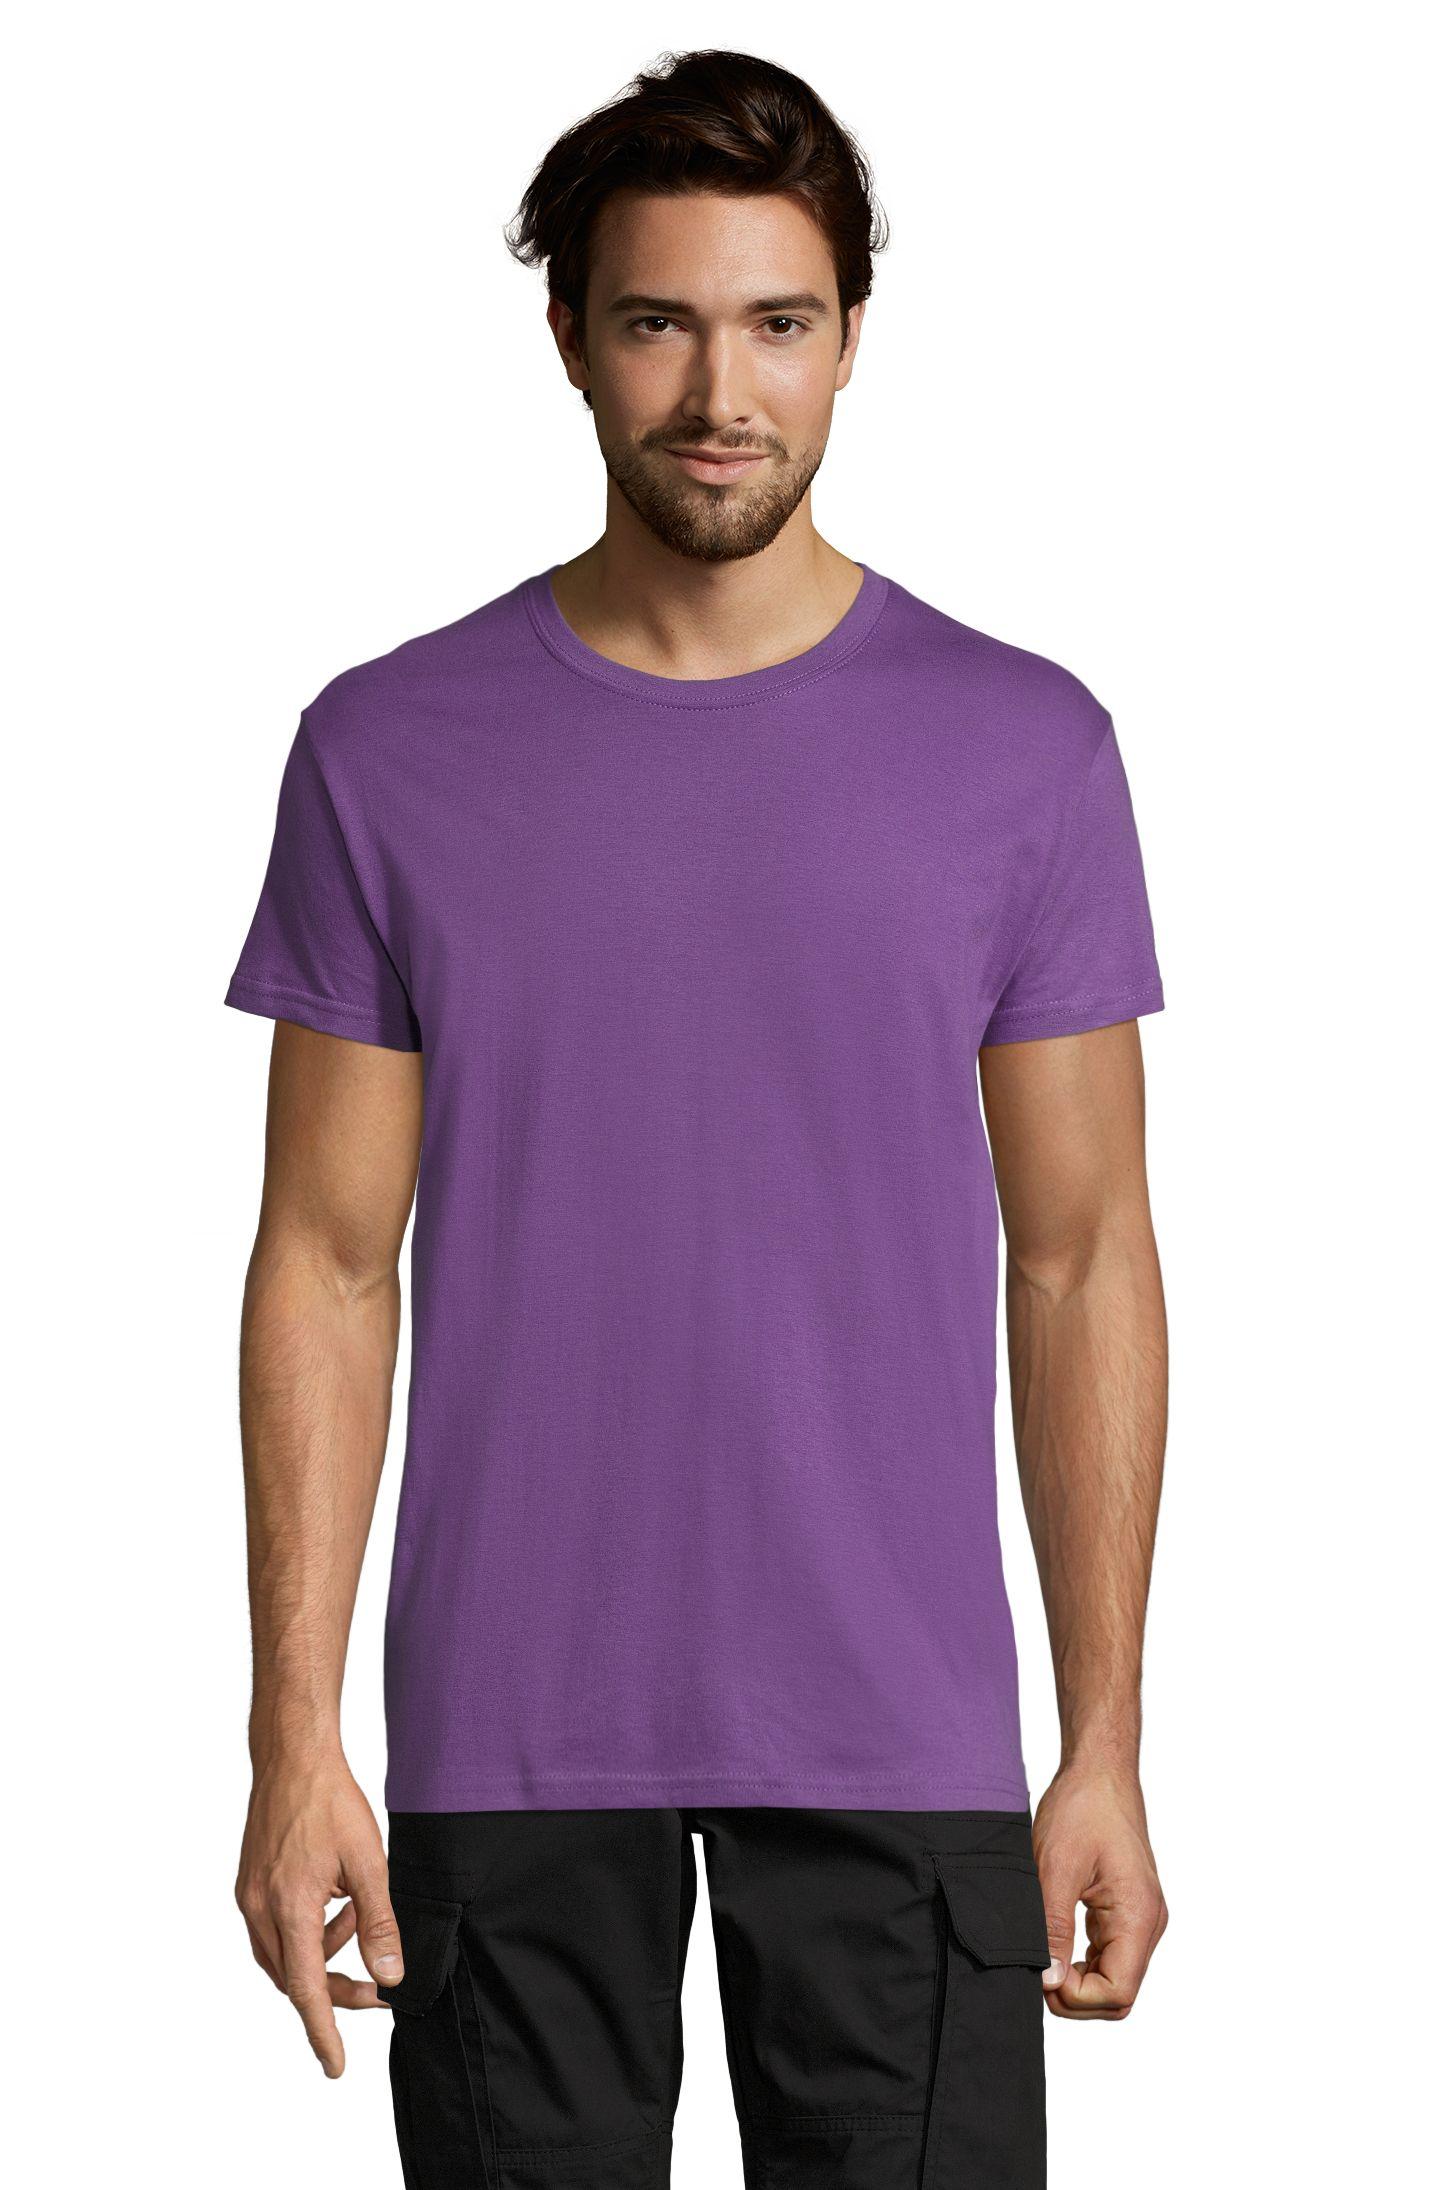 710 - Light purple